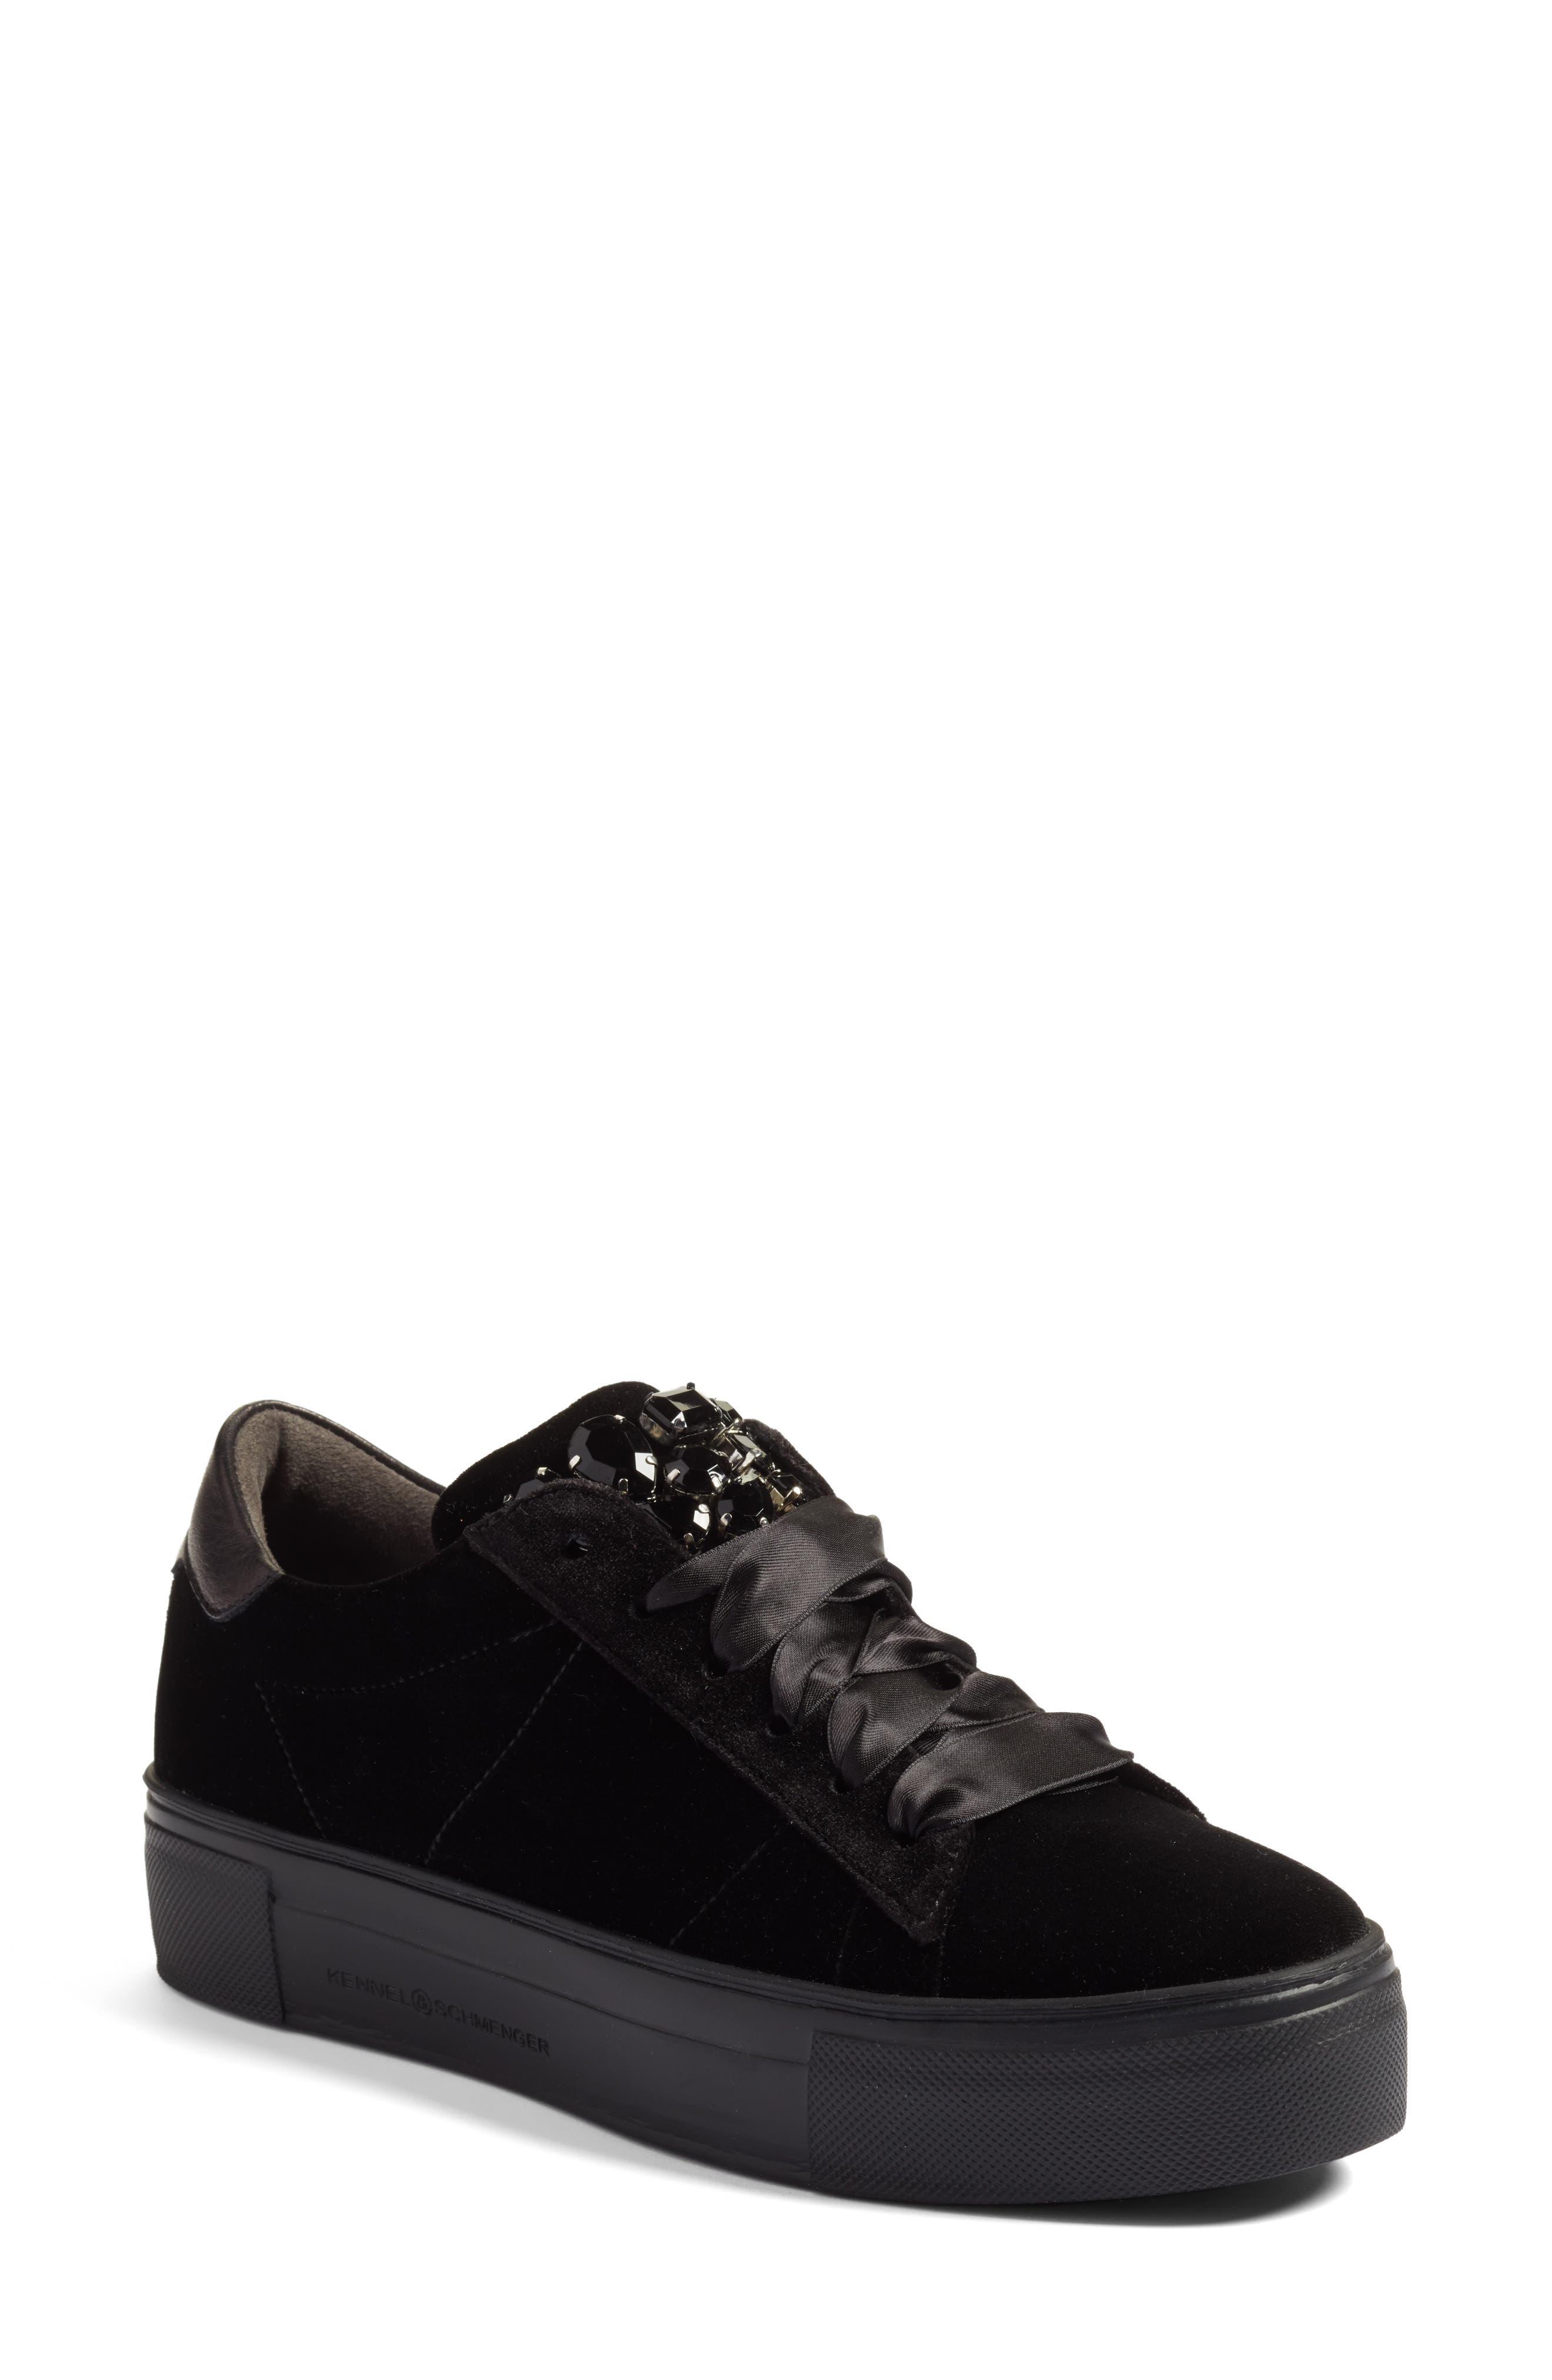 Kennel & Schmenger Big Velvet Lace-Up Sneaker,                         Main,                         color,